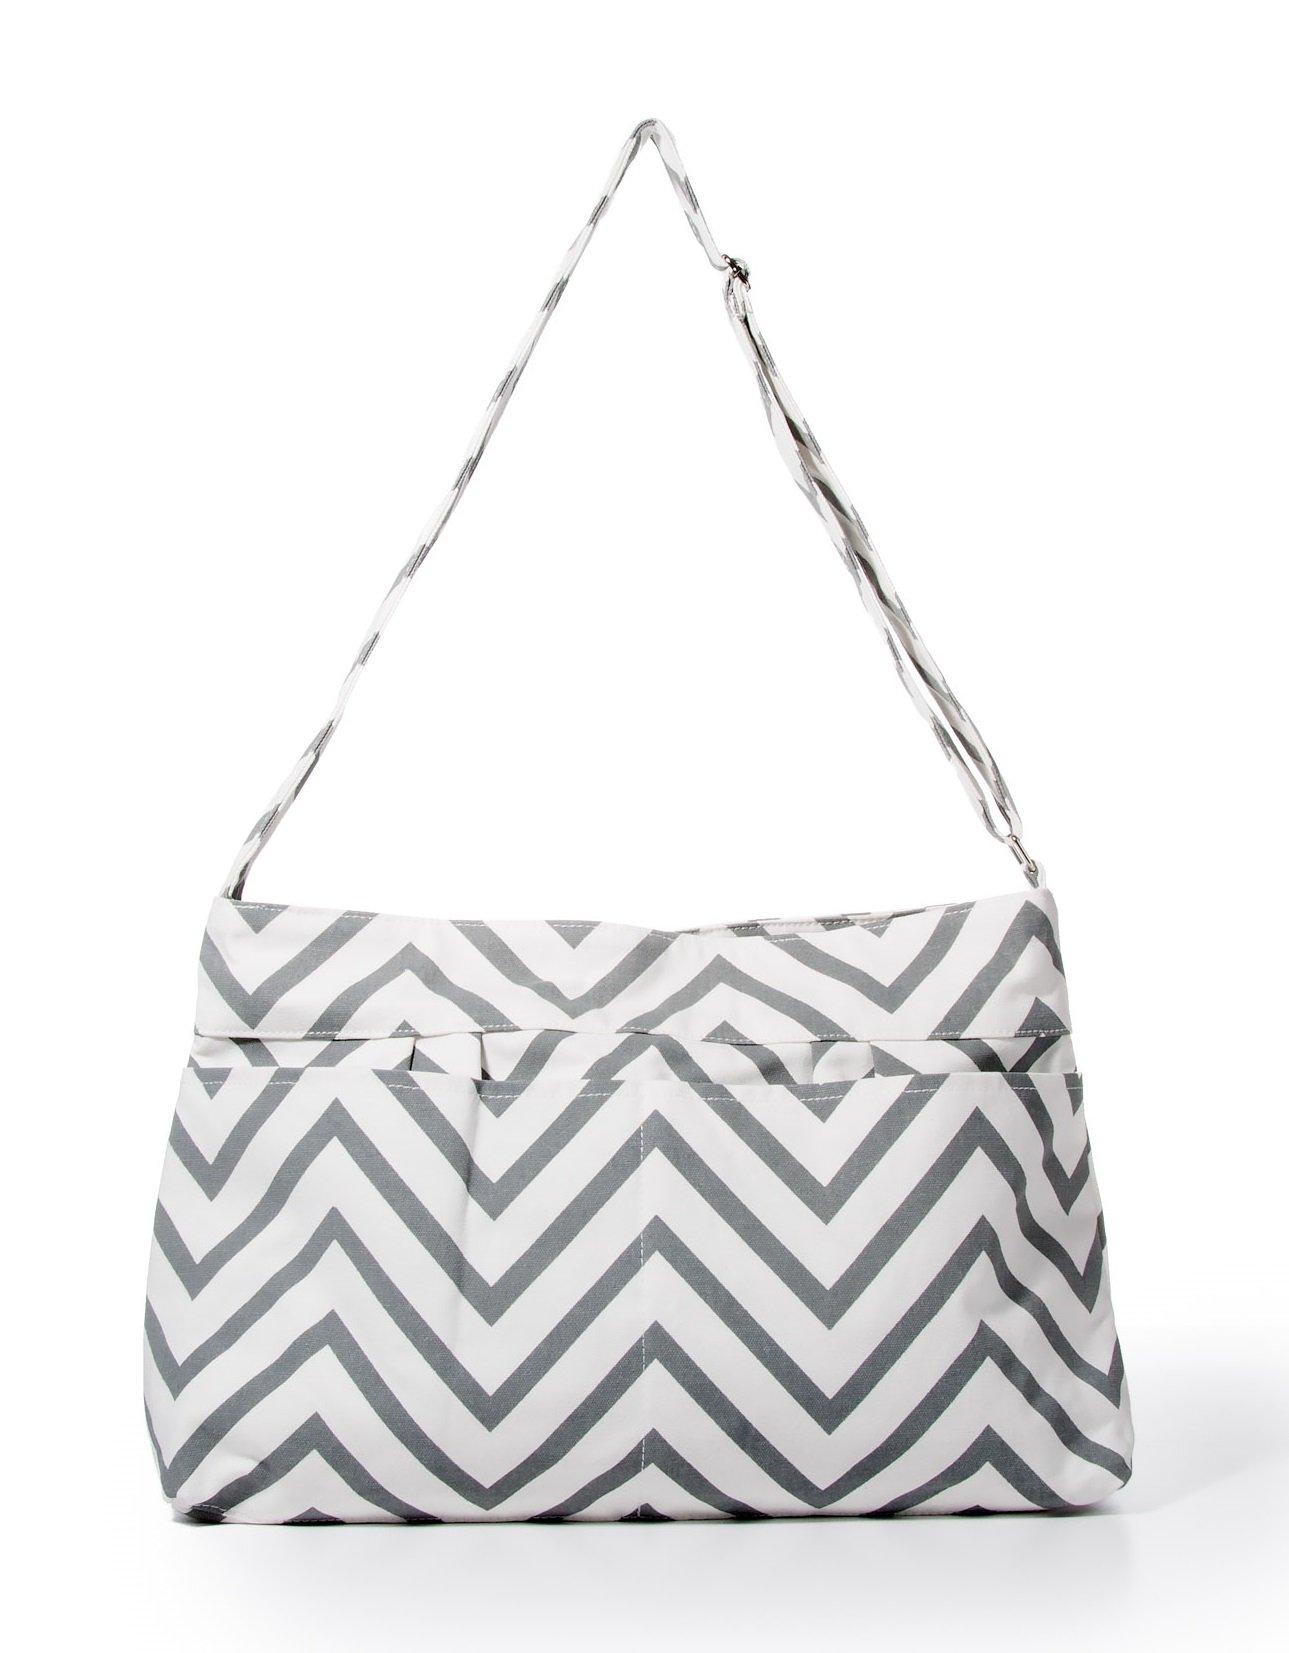 Gray Chevron Tote Diaper Bag By White Elm